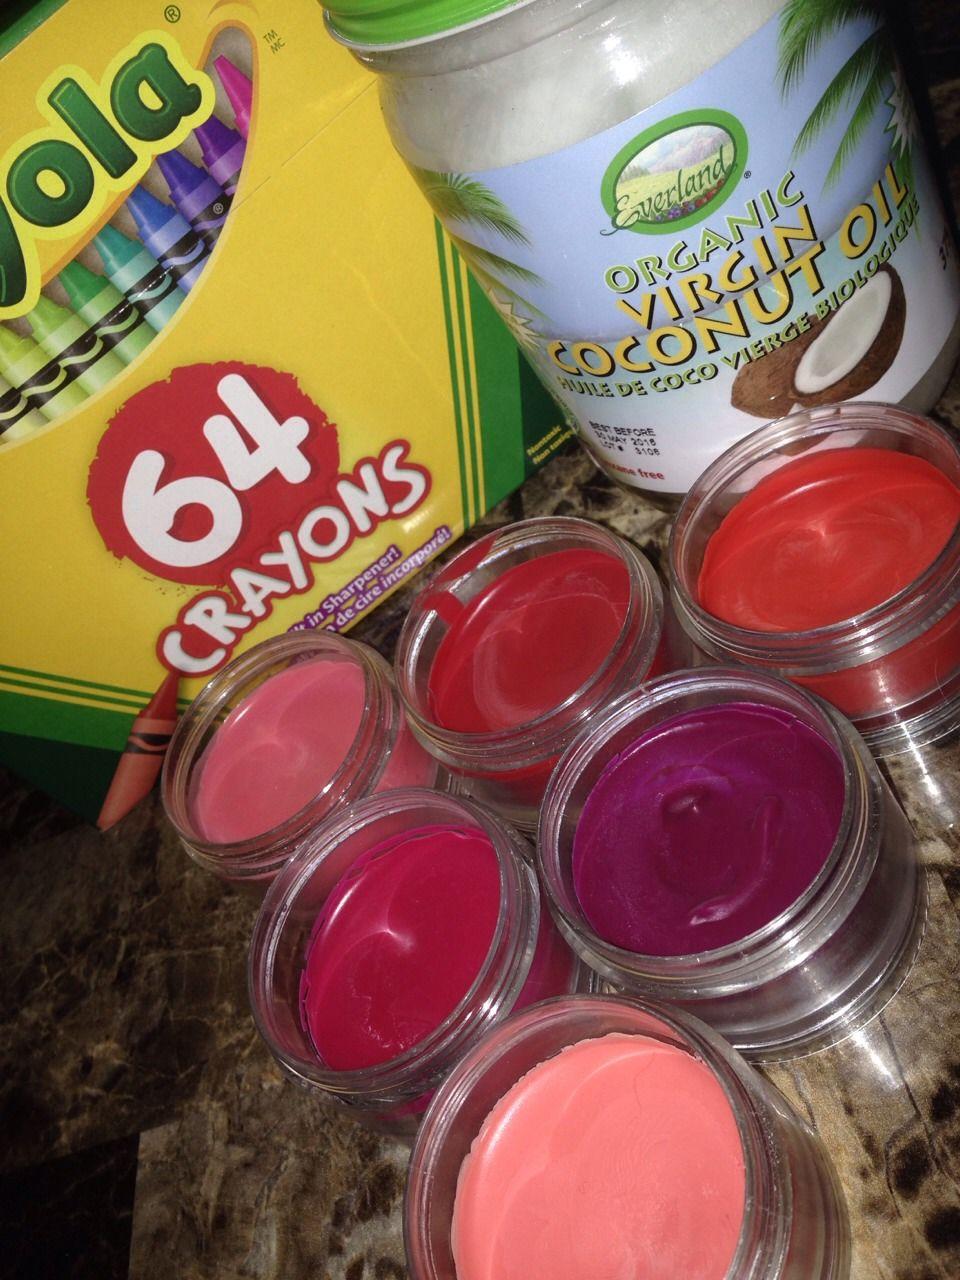 Diy lipstick using coconut oil and crayola crayons